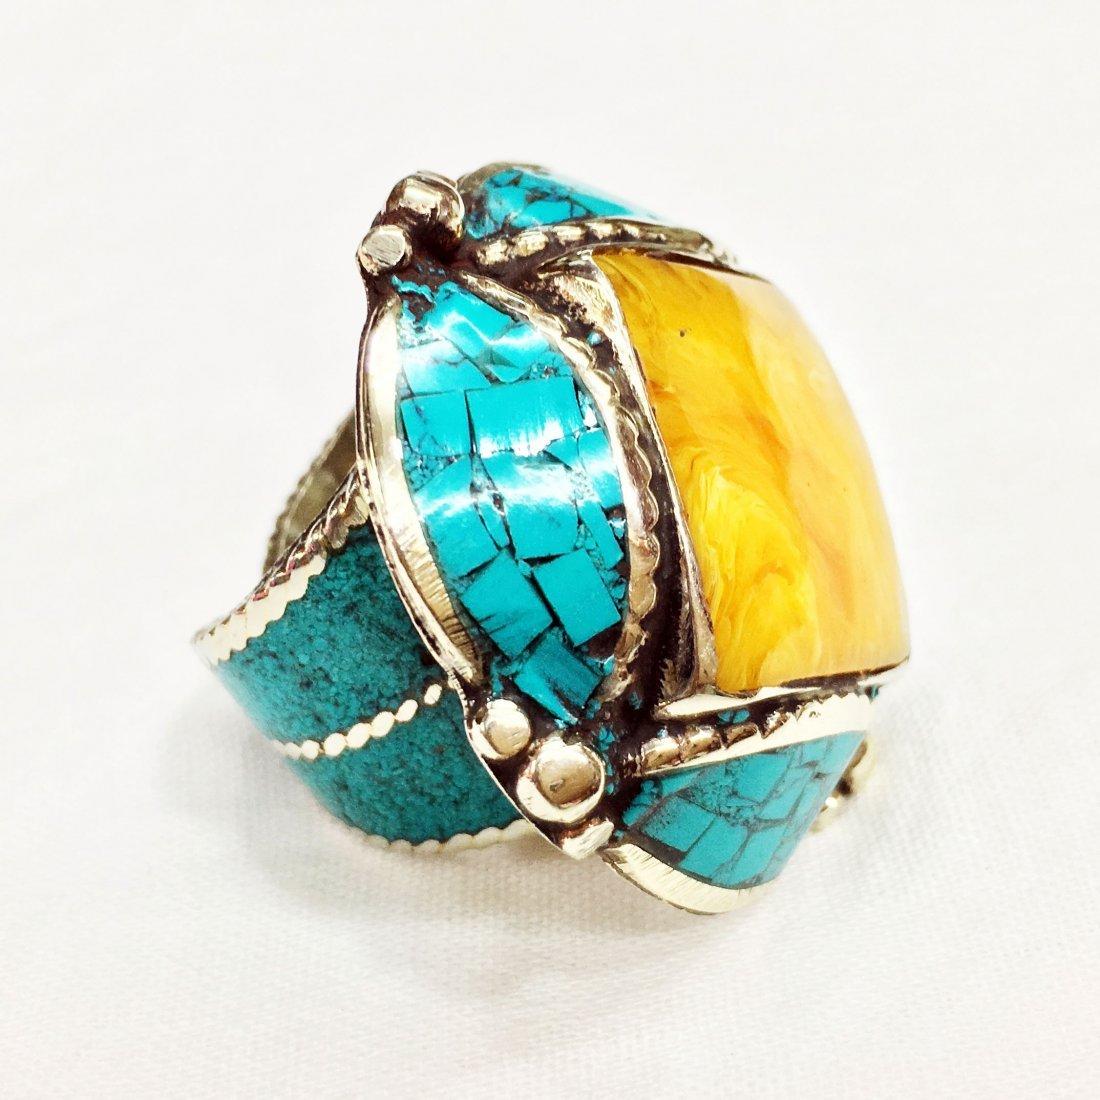 Free Size - Turquoise & Amber Tibetan Silver Ring - 2